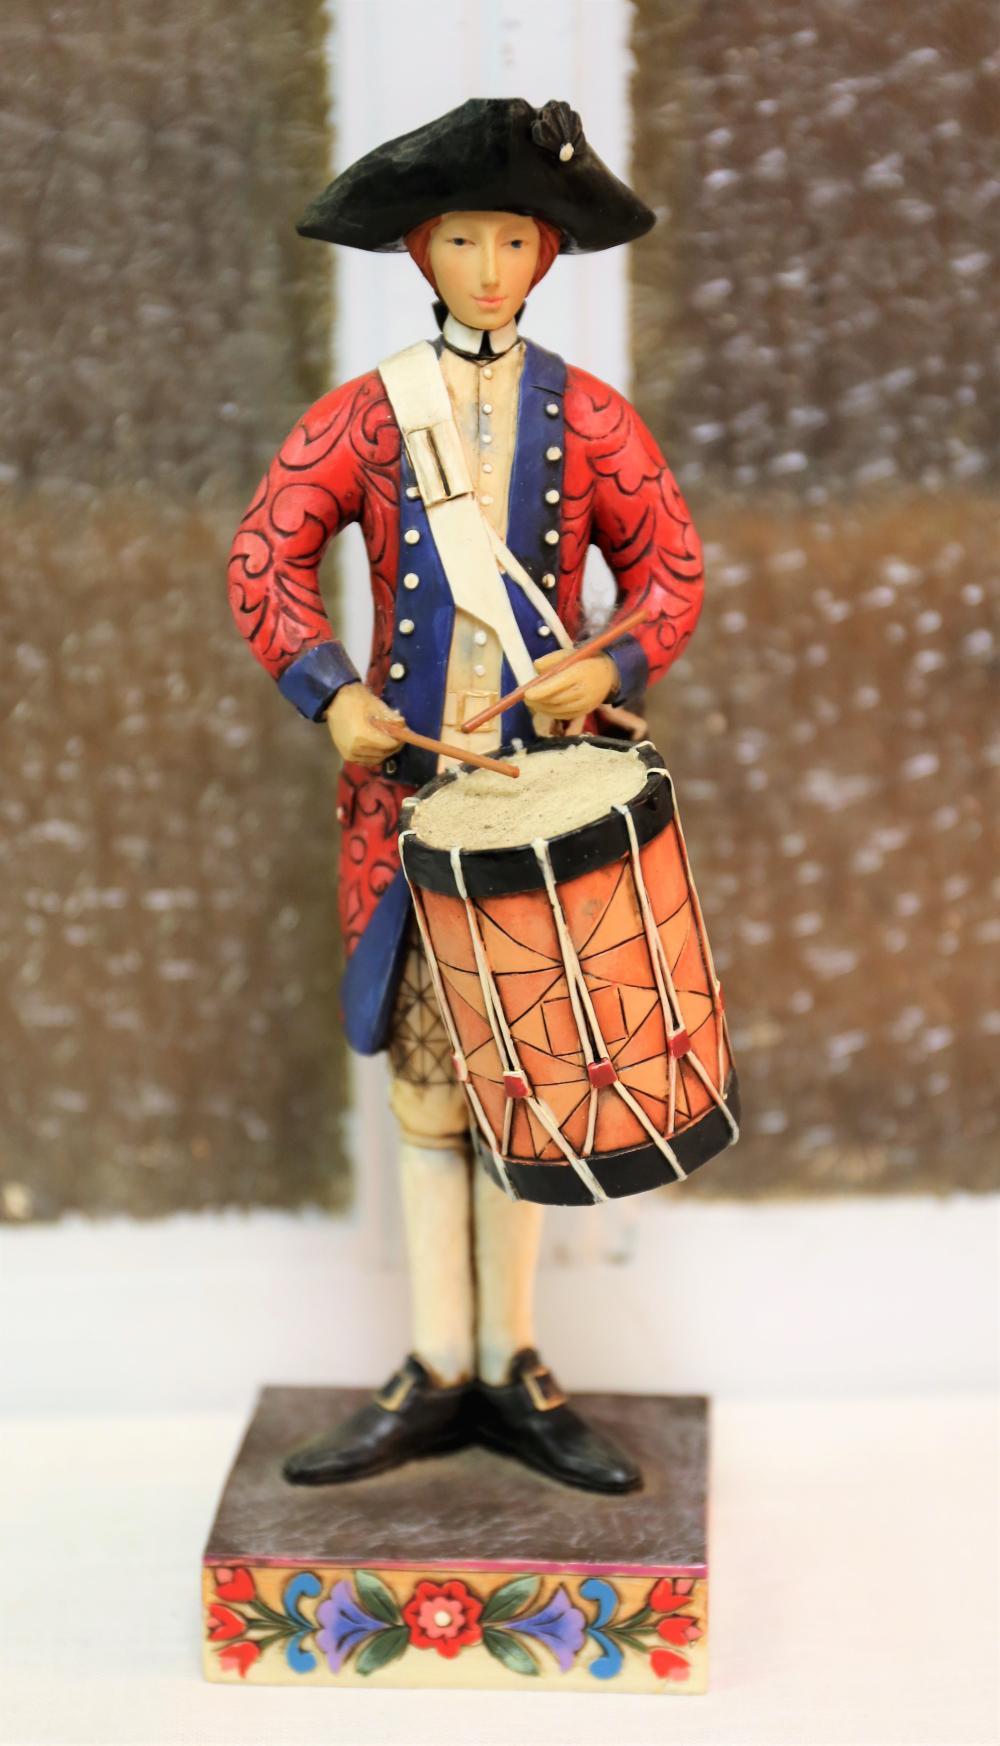 Jim Shore drummer figurine